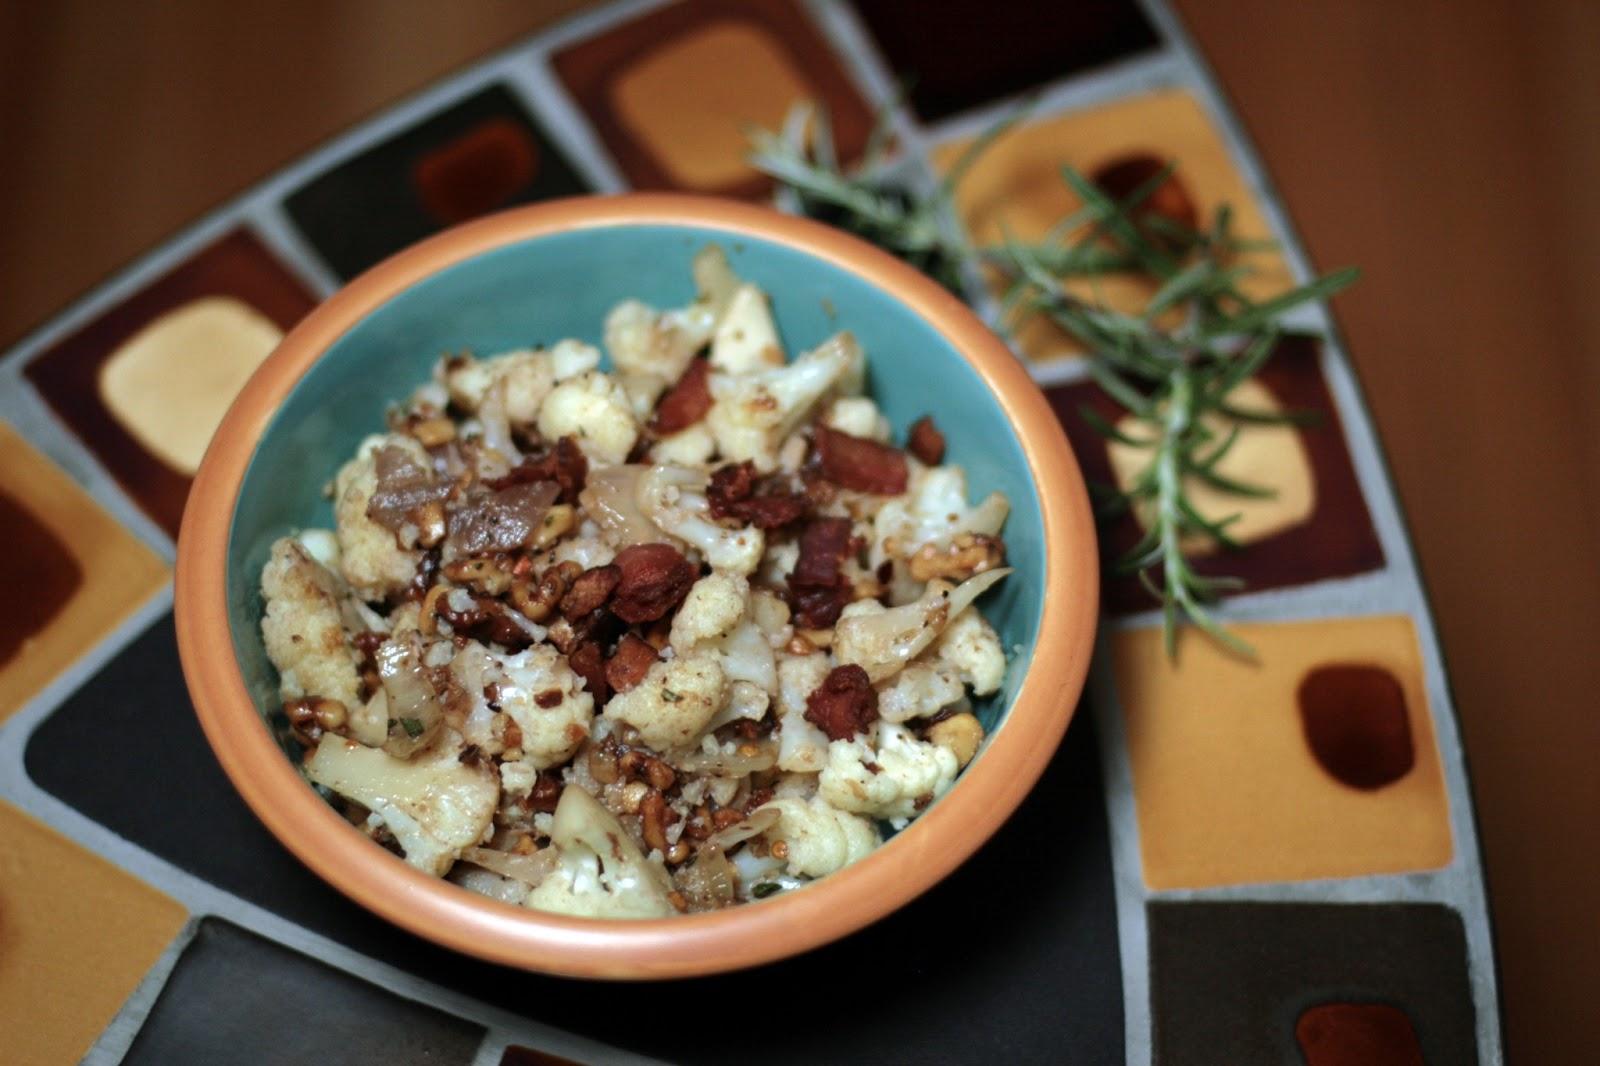 Local Food Rocks: Cauliflower with Walnuts and Rosemary